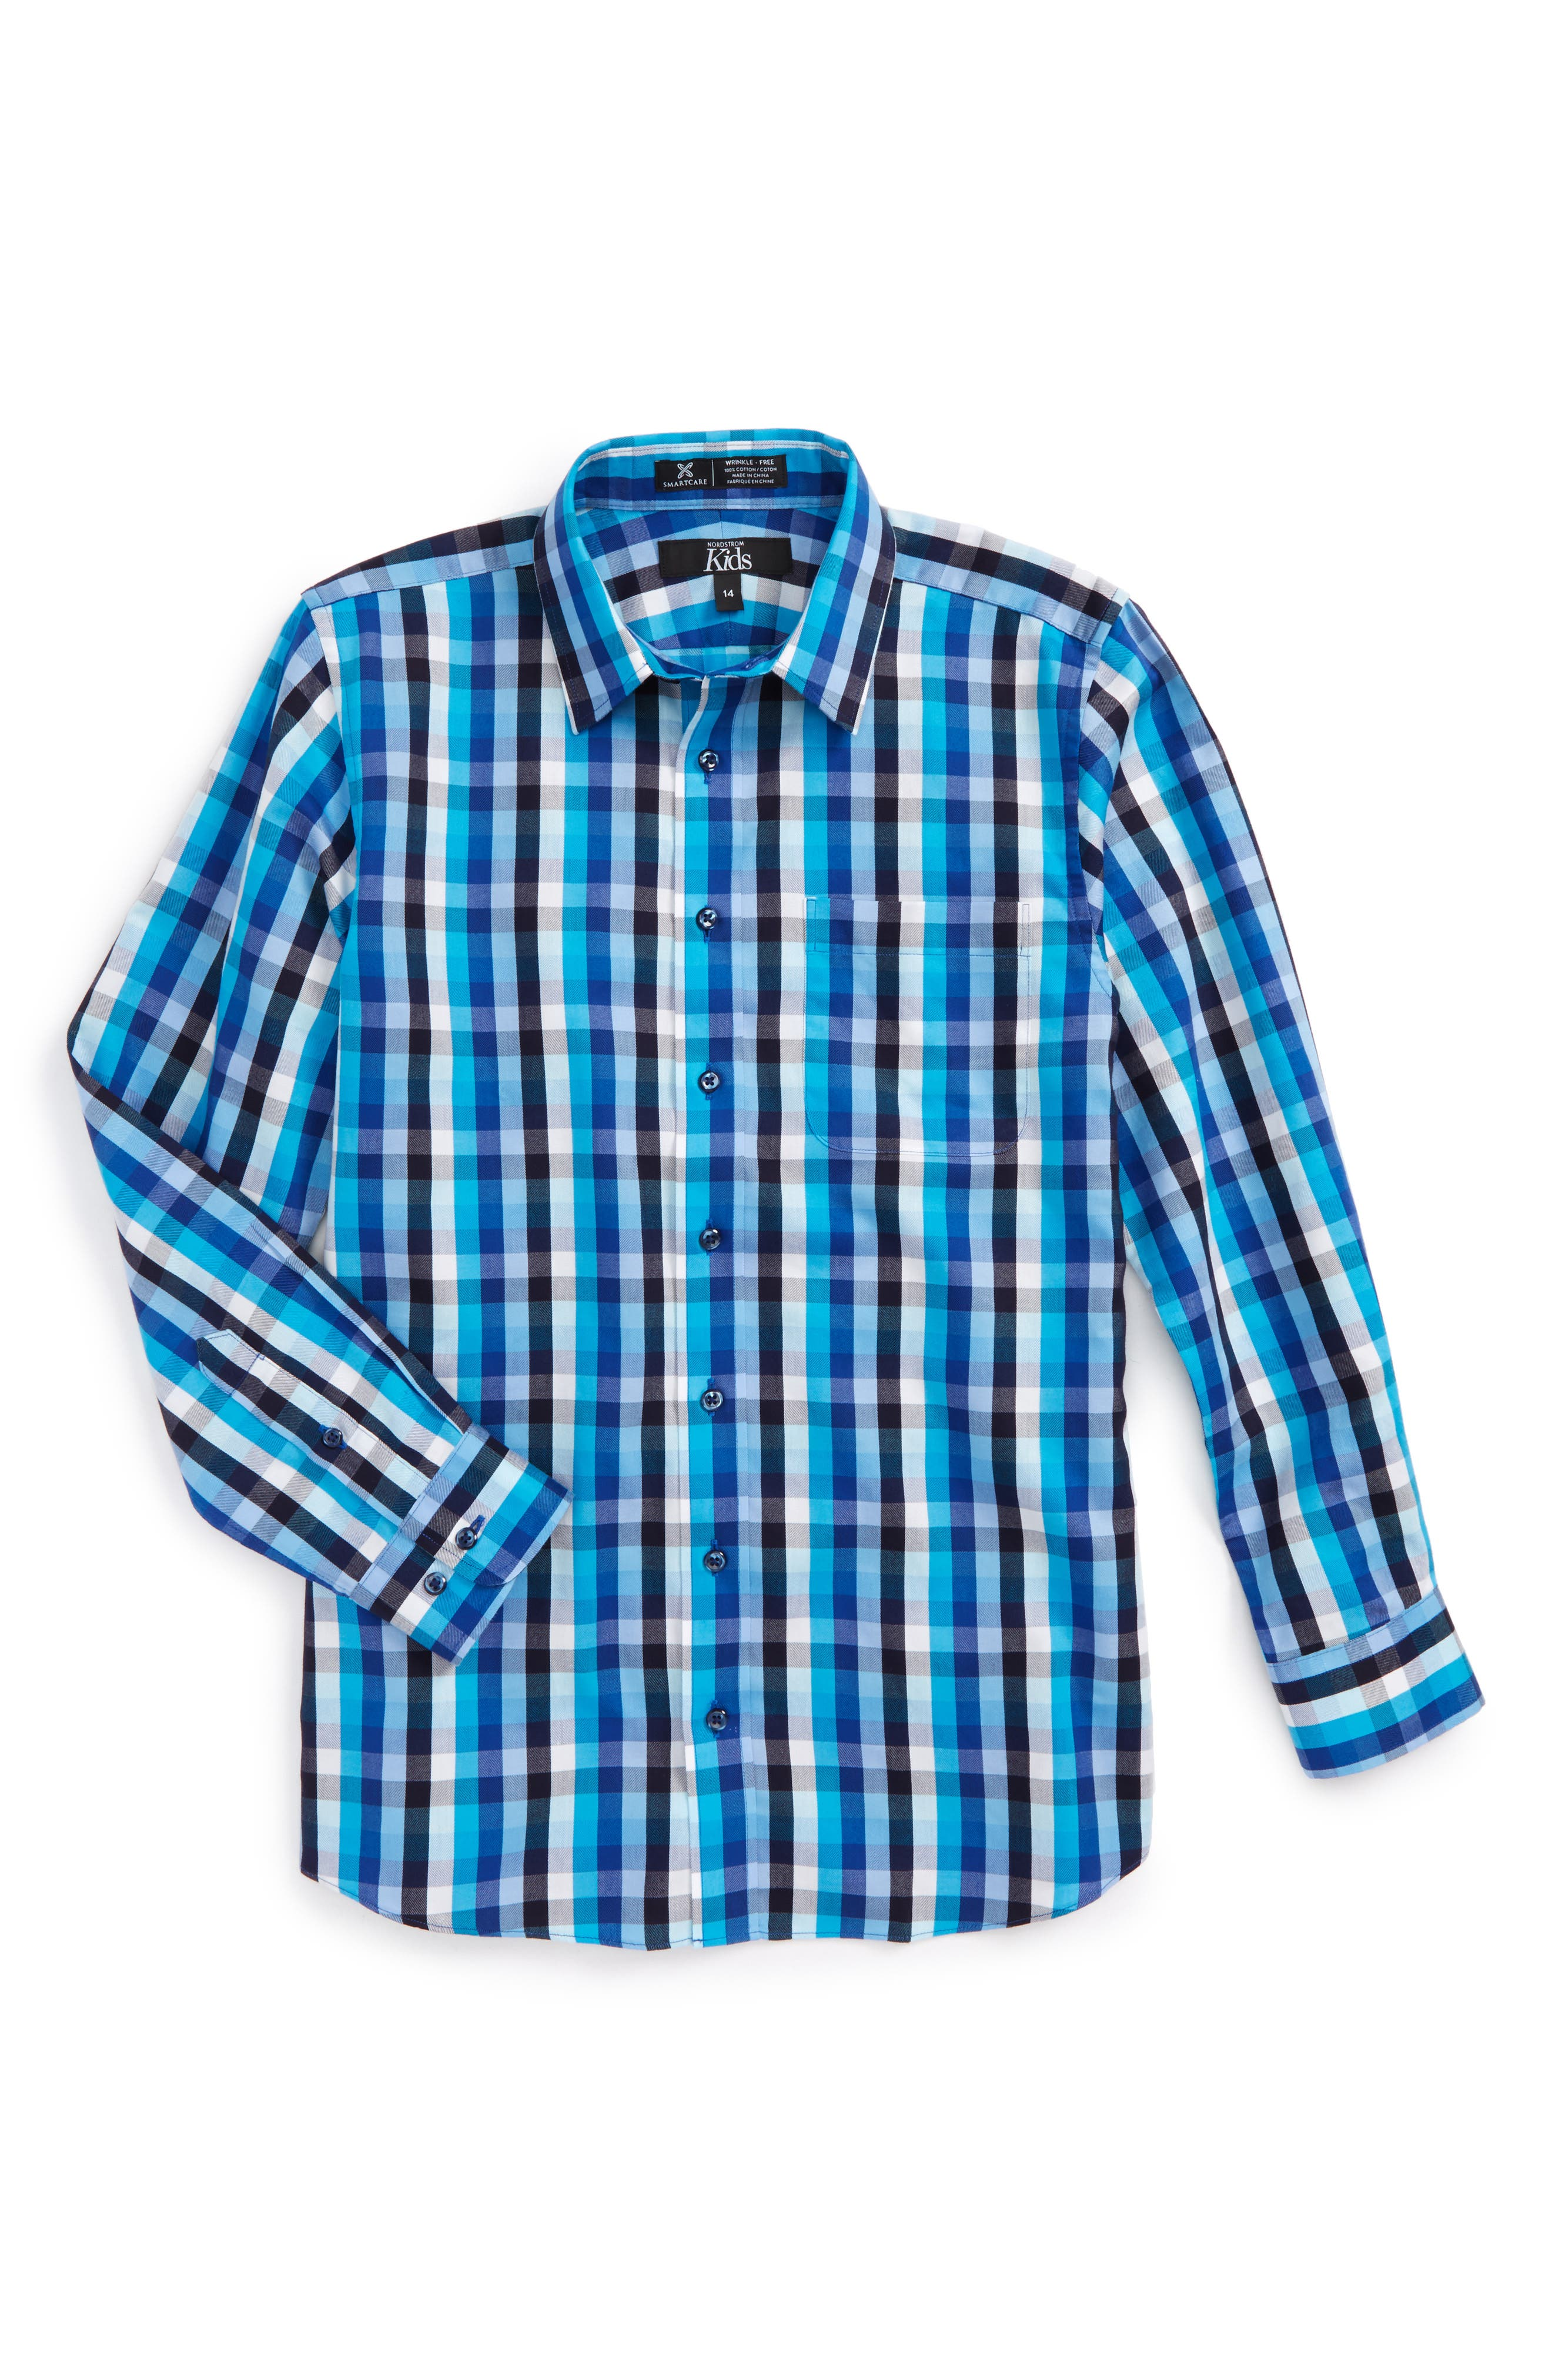 Smartcare<sup>™</sup> Danube Plaid Dress Shirt,                         Main,                         color, Blue Danube Plaid